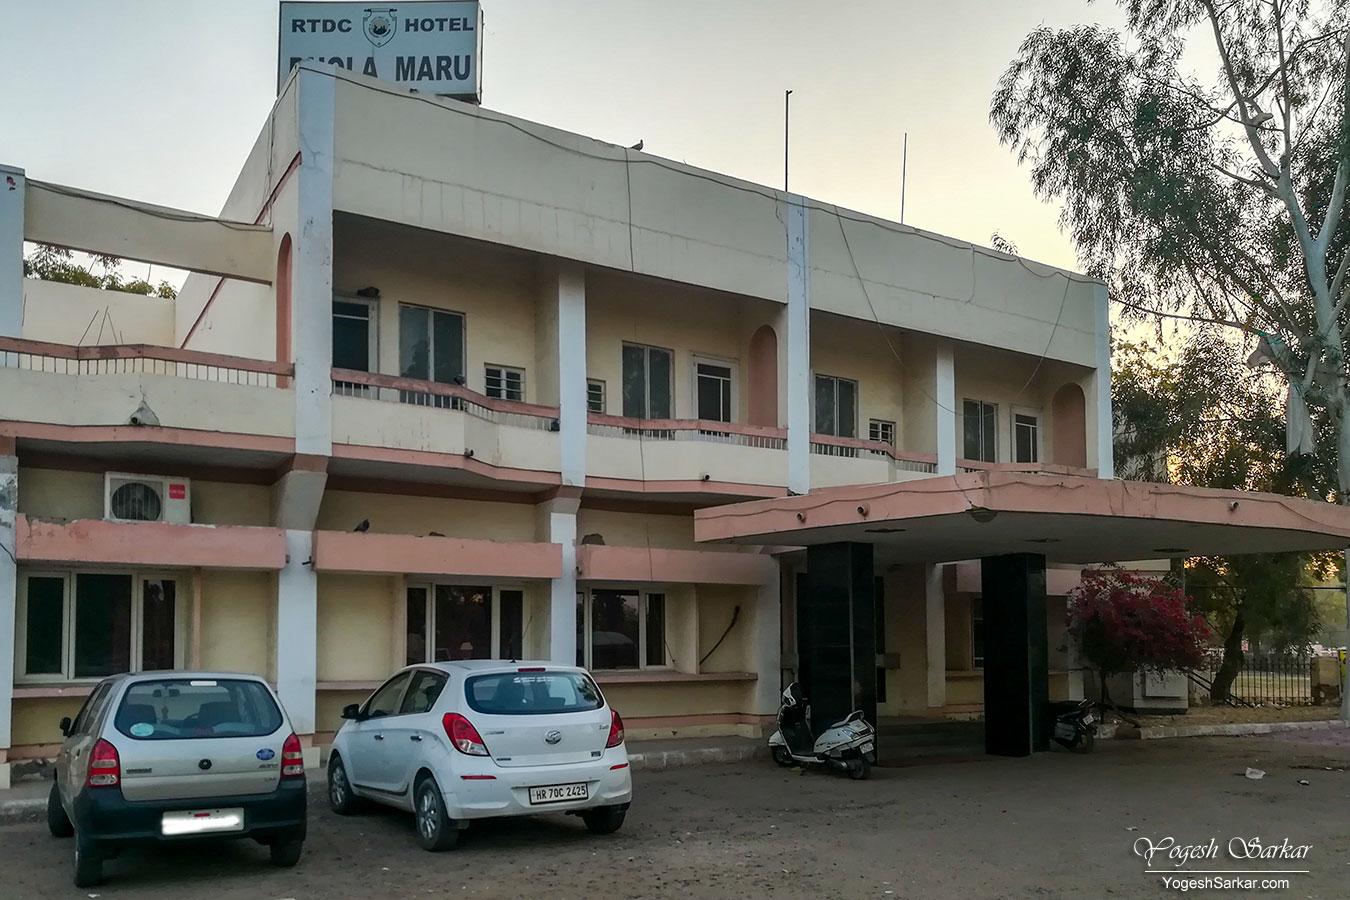 19-car-at-dhola-maru-hotel.jpg